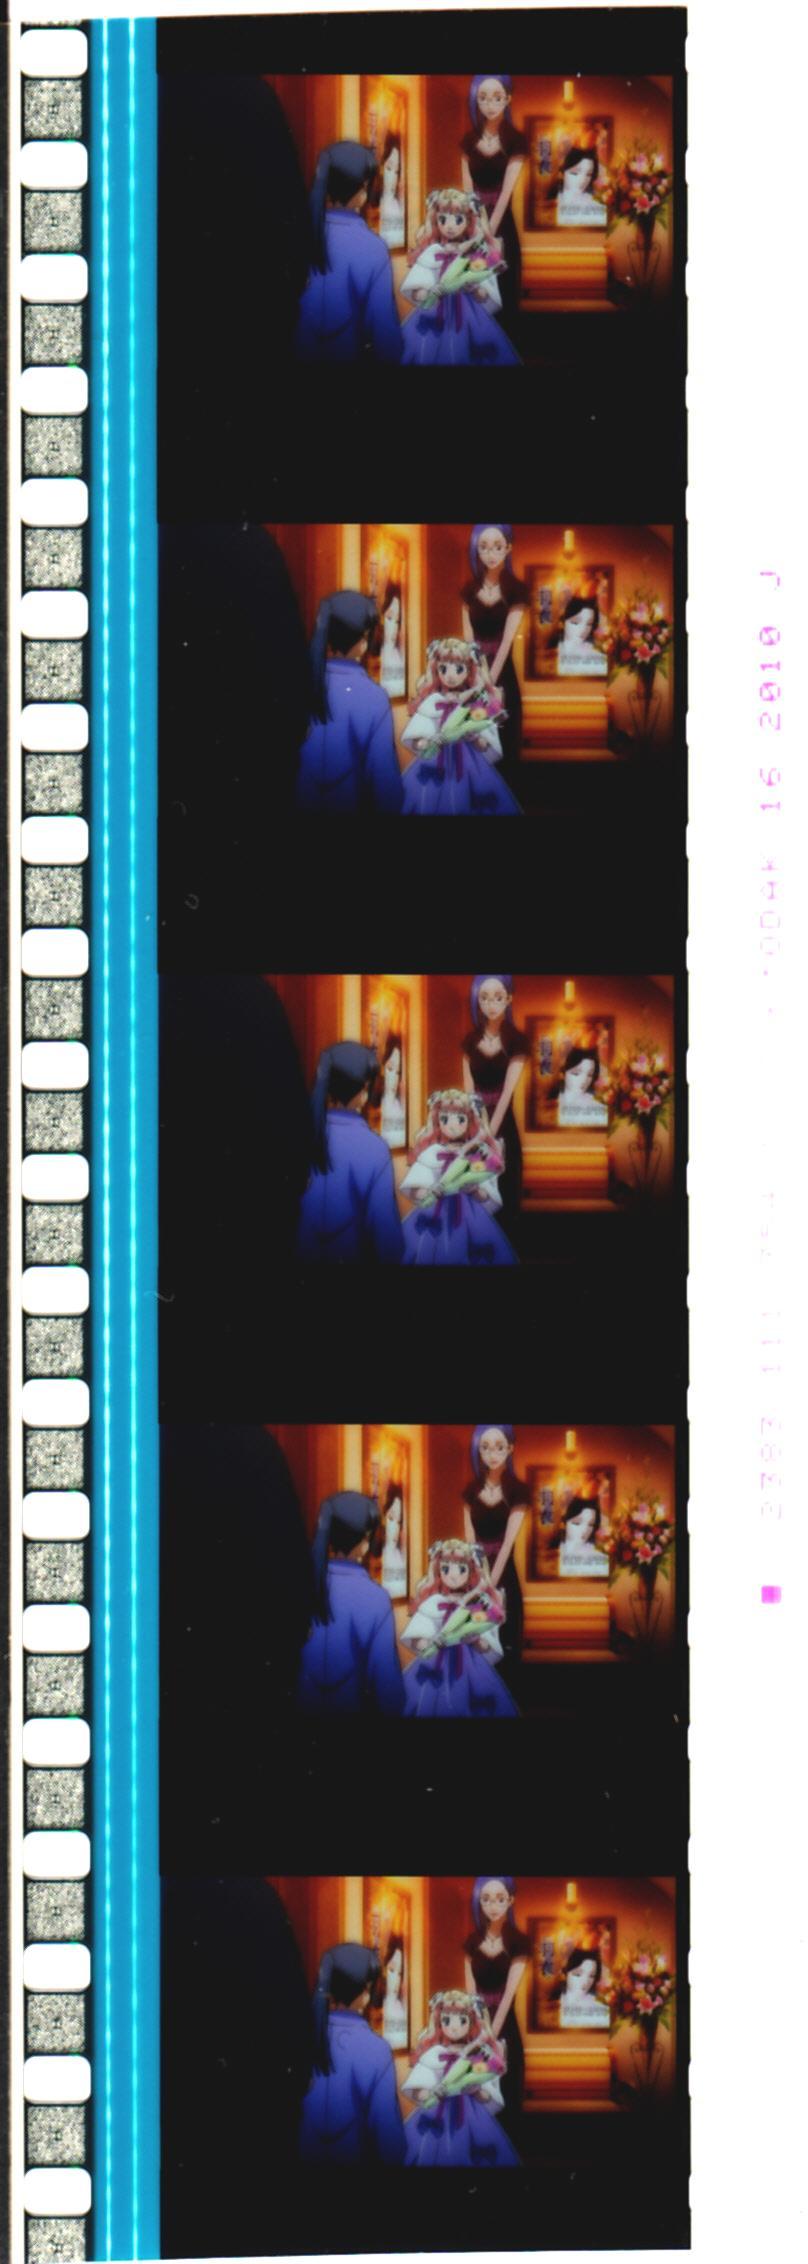 wwwdotuporg2161006_convert_20111020212212.jpg